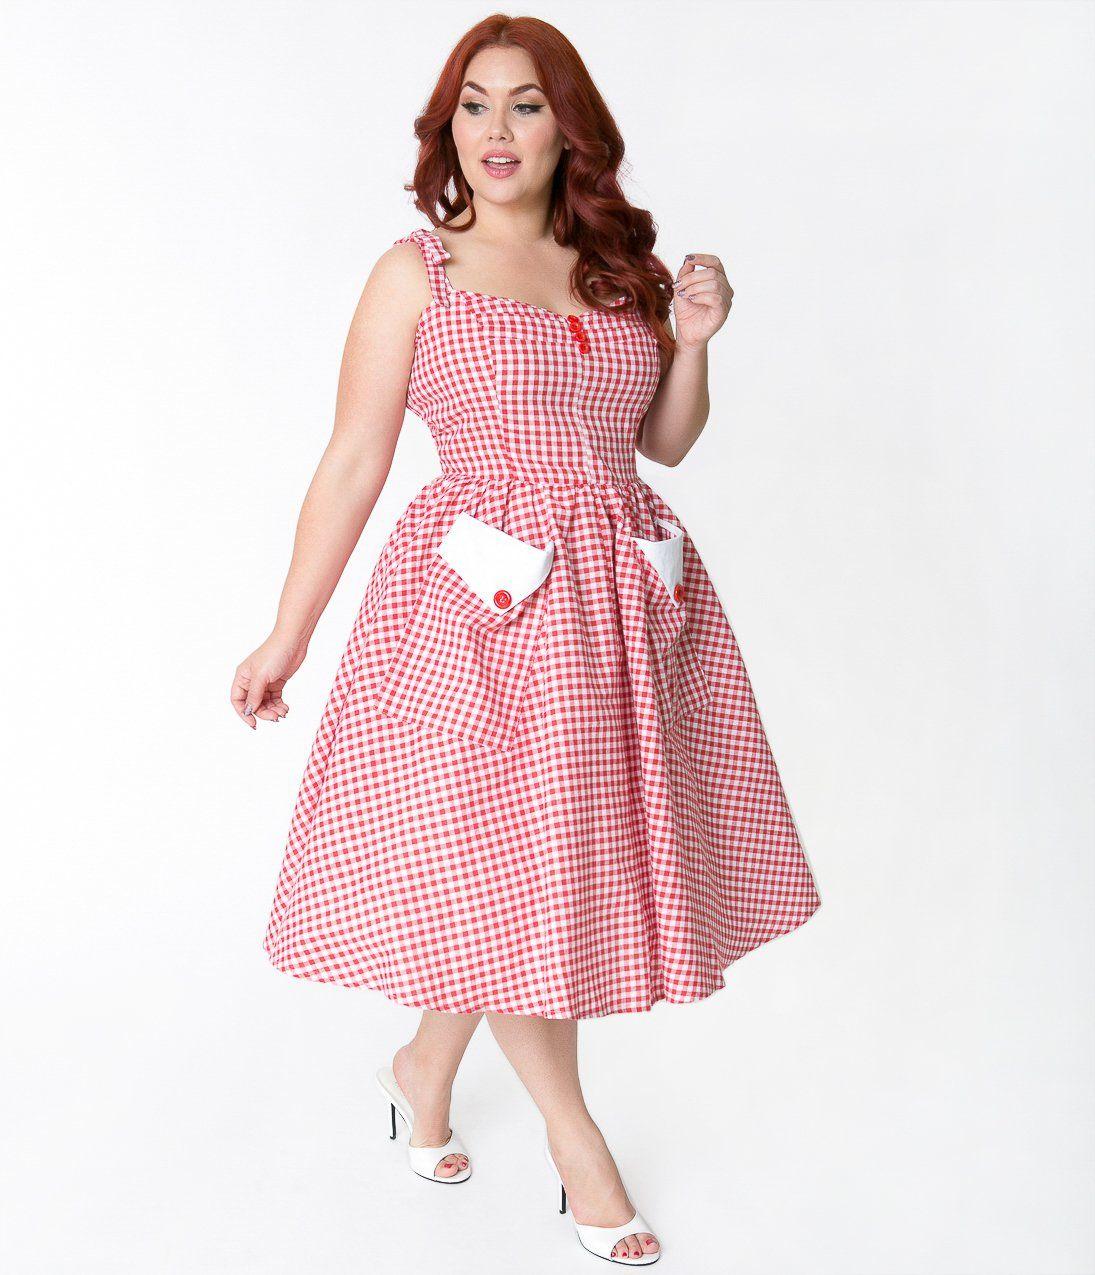 Rockabilly Dresses Rockabilly Clothing Viva Las Vegas Plus Size Red White Gingham Retr Plus Size Vintage Dresses Plus Size Dresses Plus Size Retro Dresses